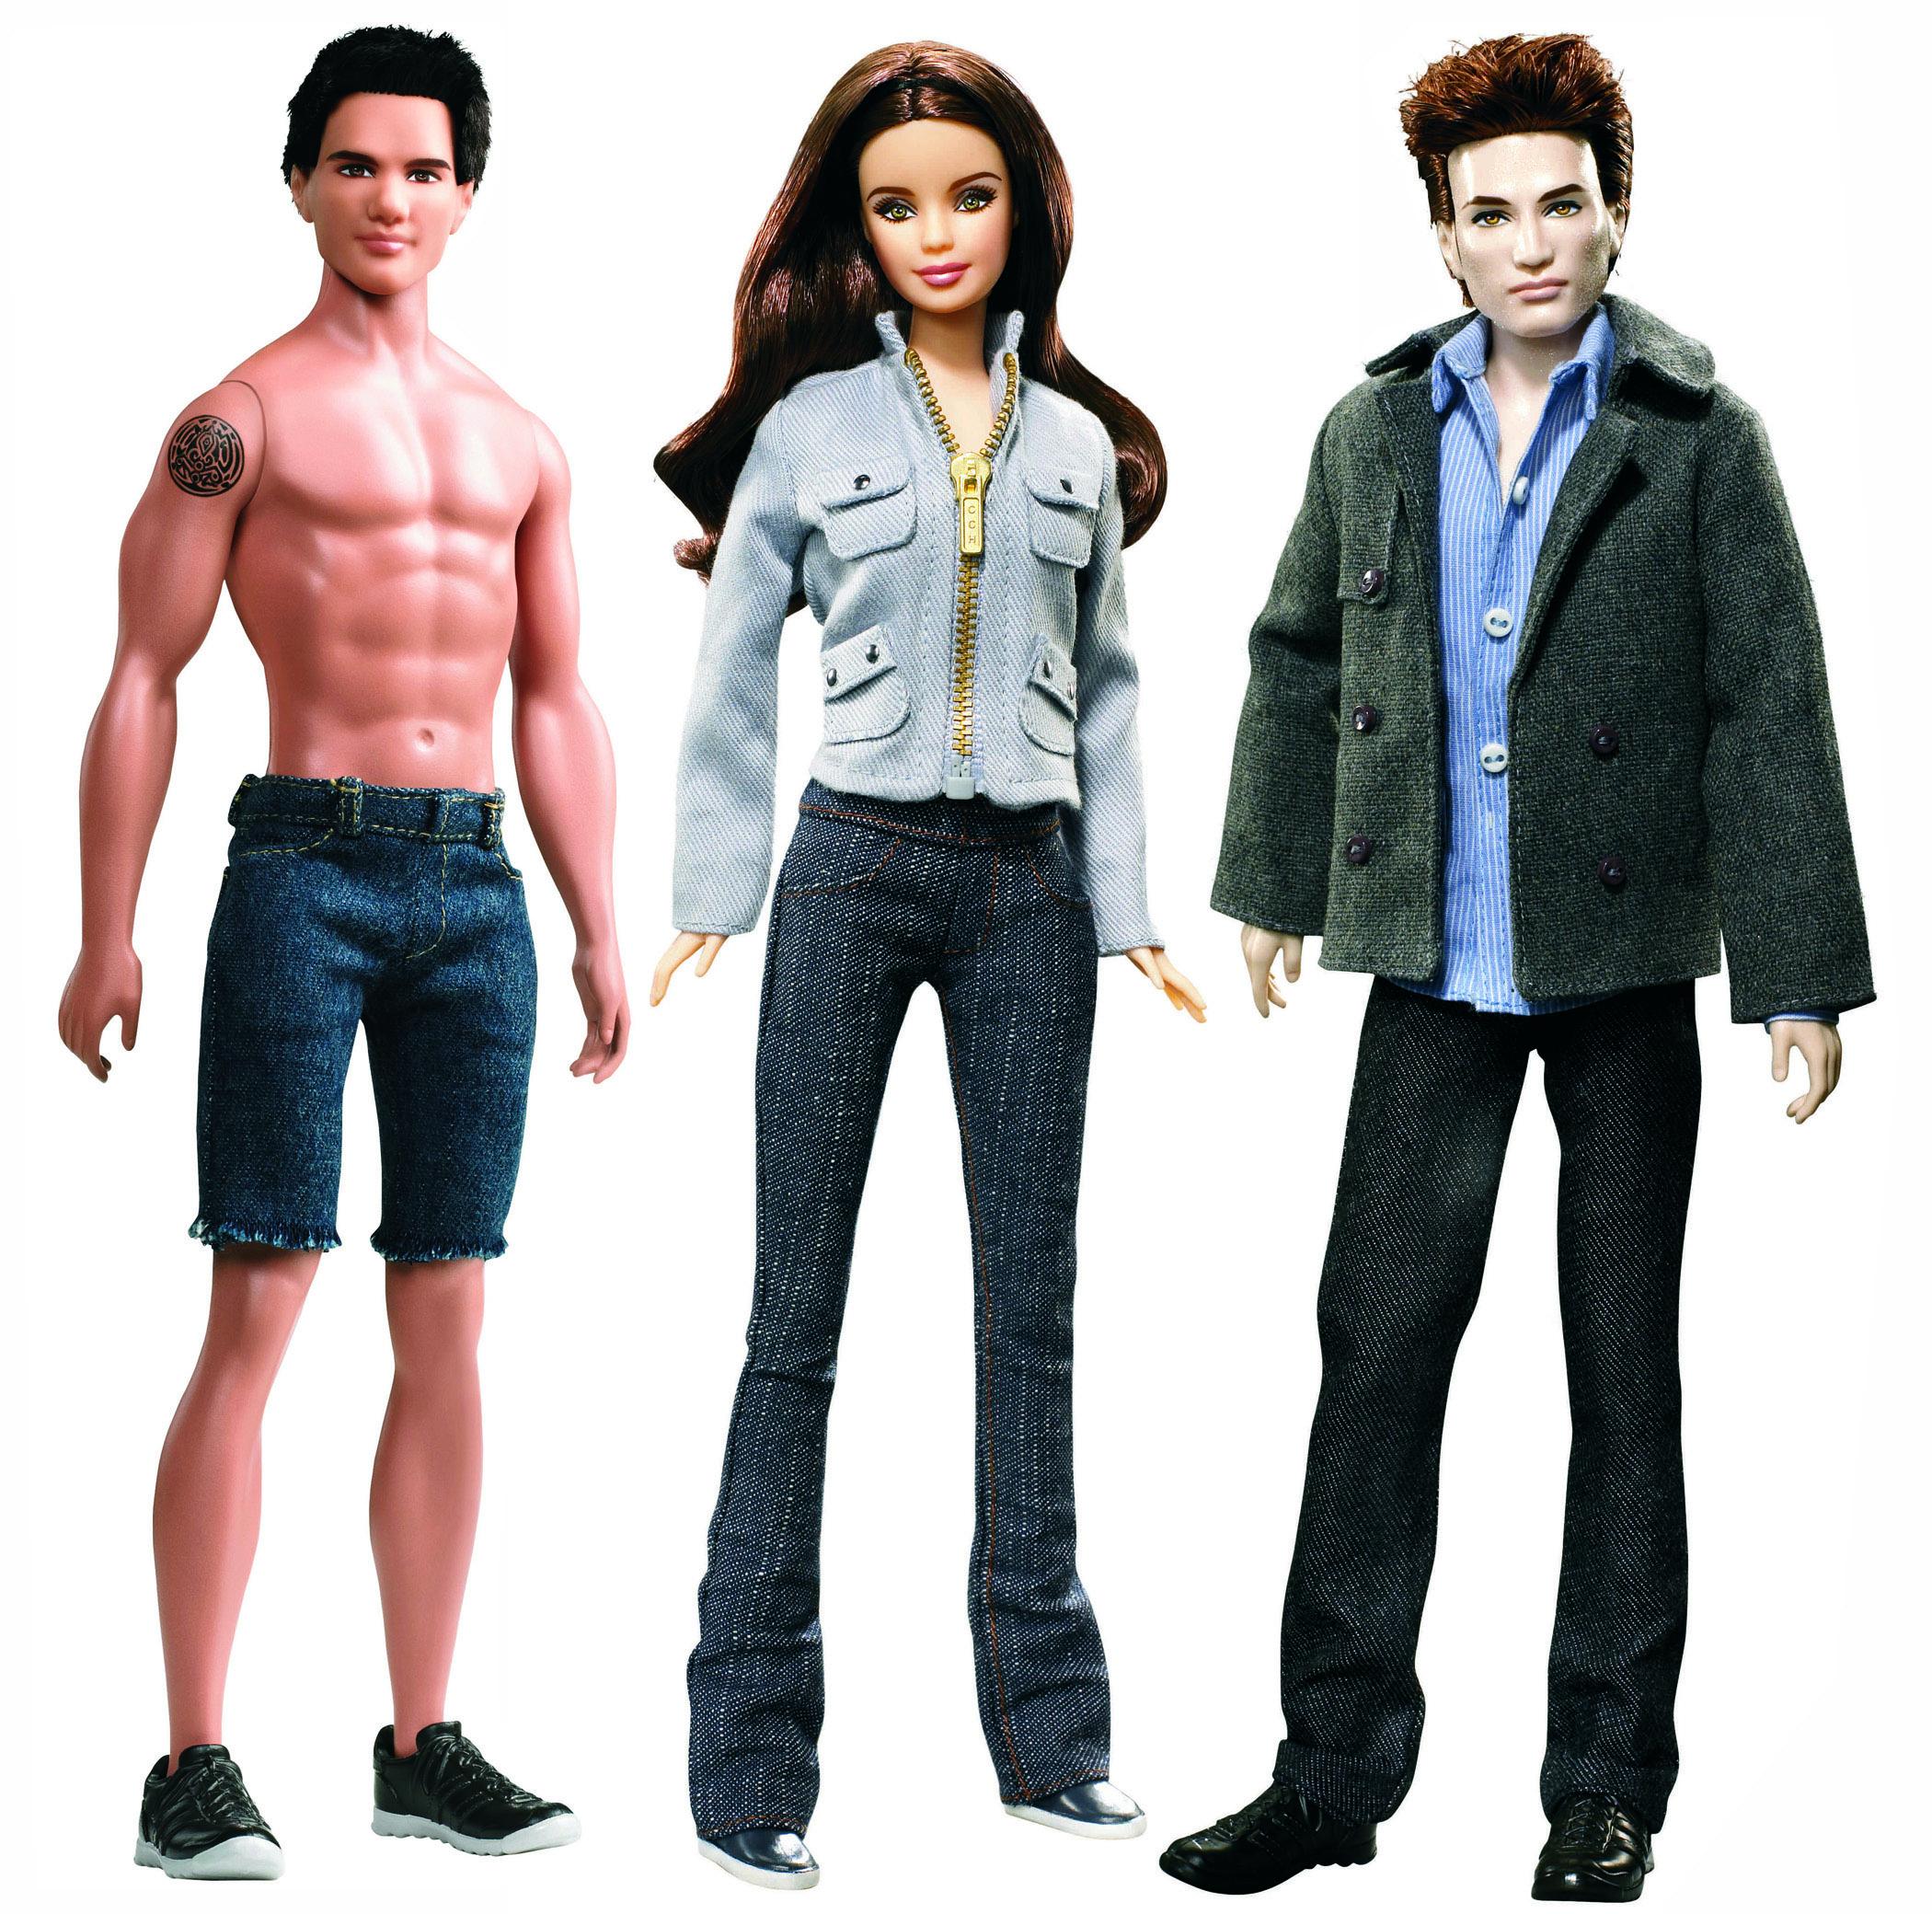 The Twilight Saga Barbies, released in 2010.